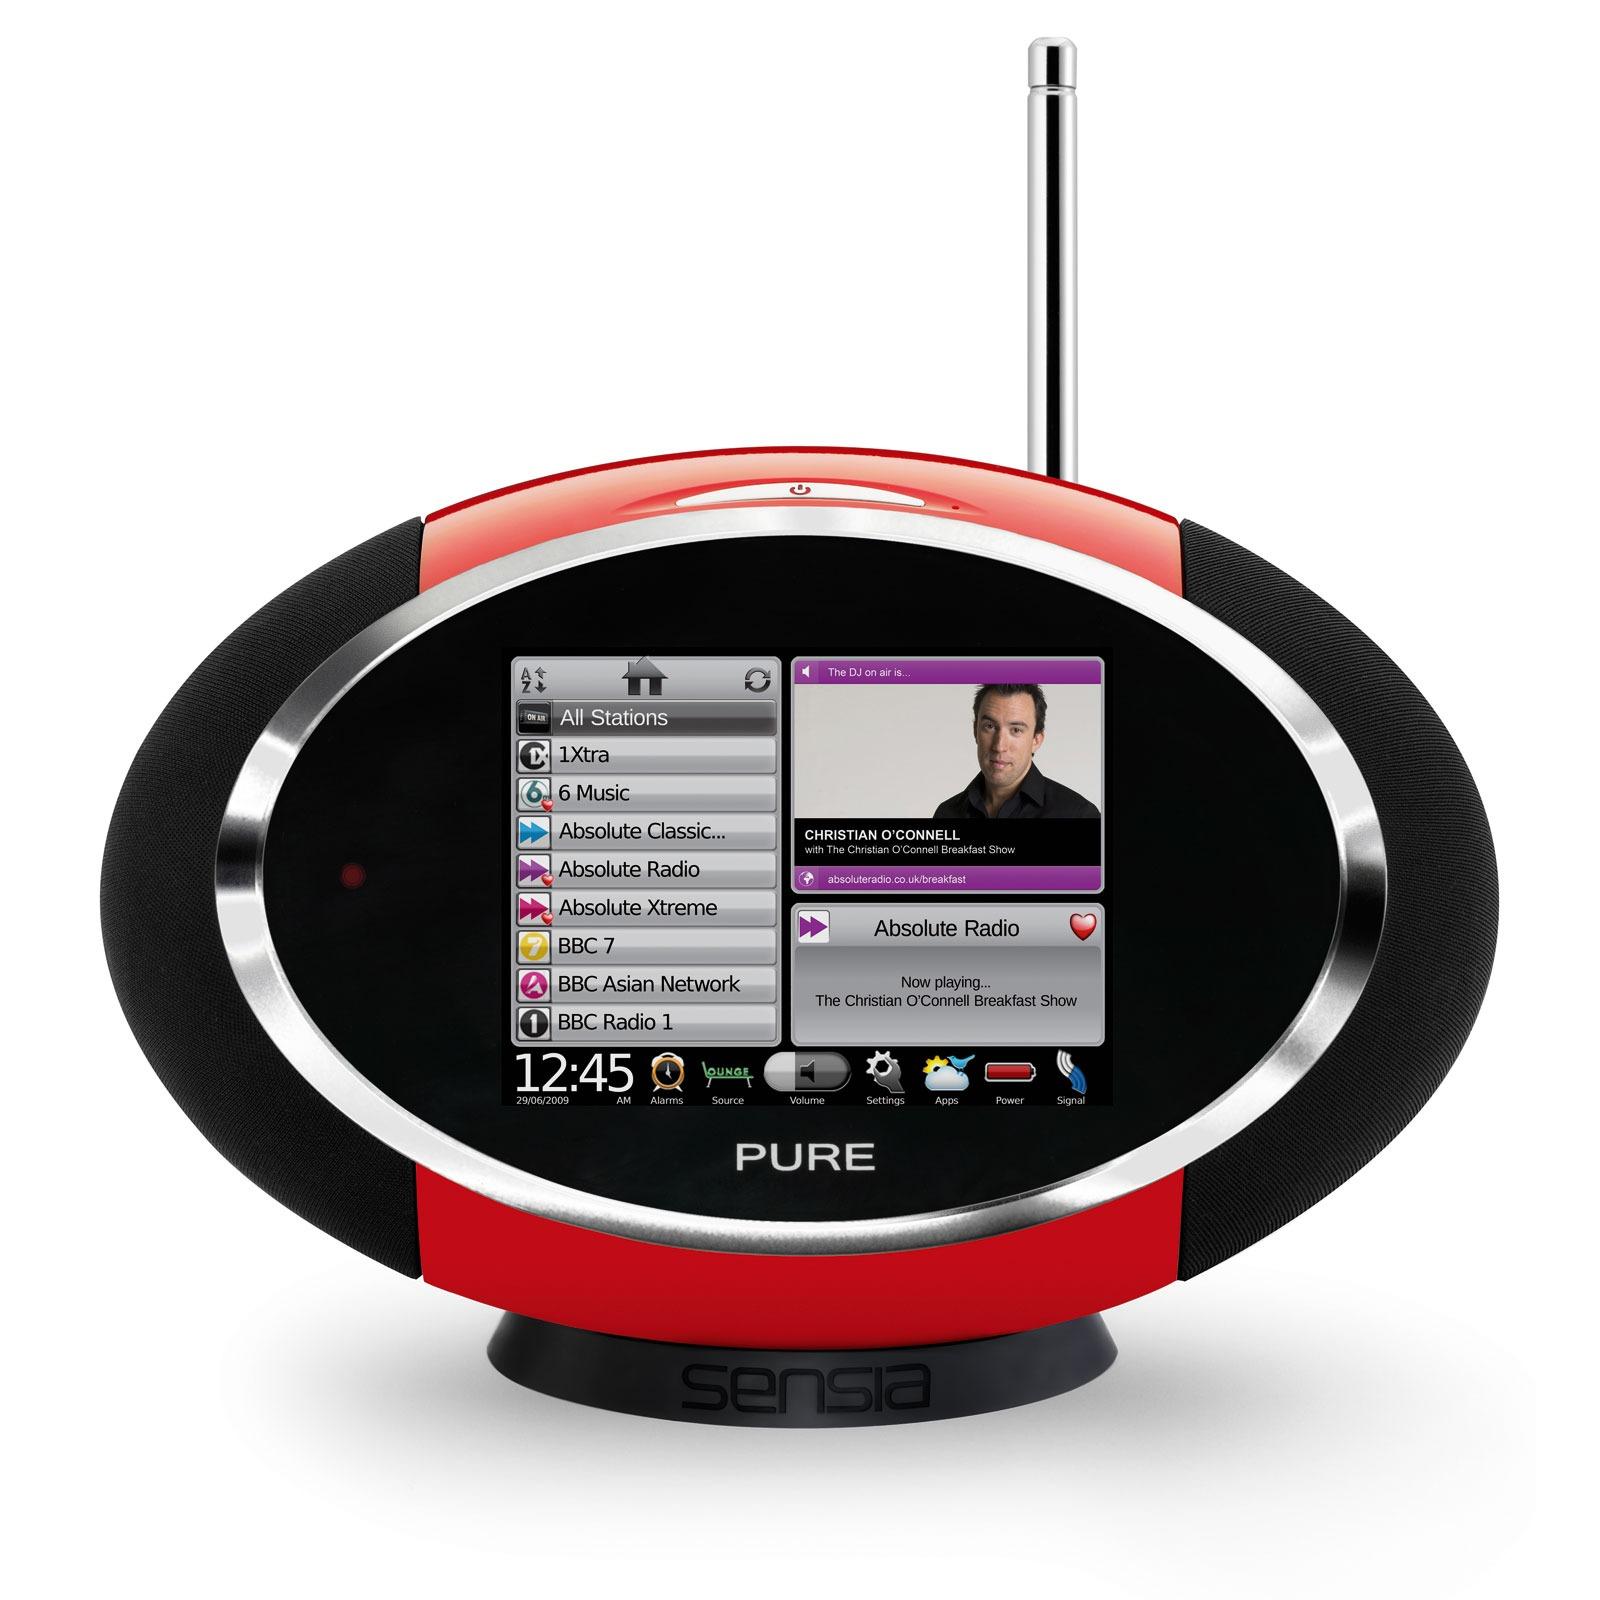 Radio & radio réveil Pure Sensia Red Radio FM compatible RNT et Webradio avec écran tactile